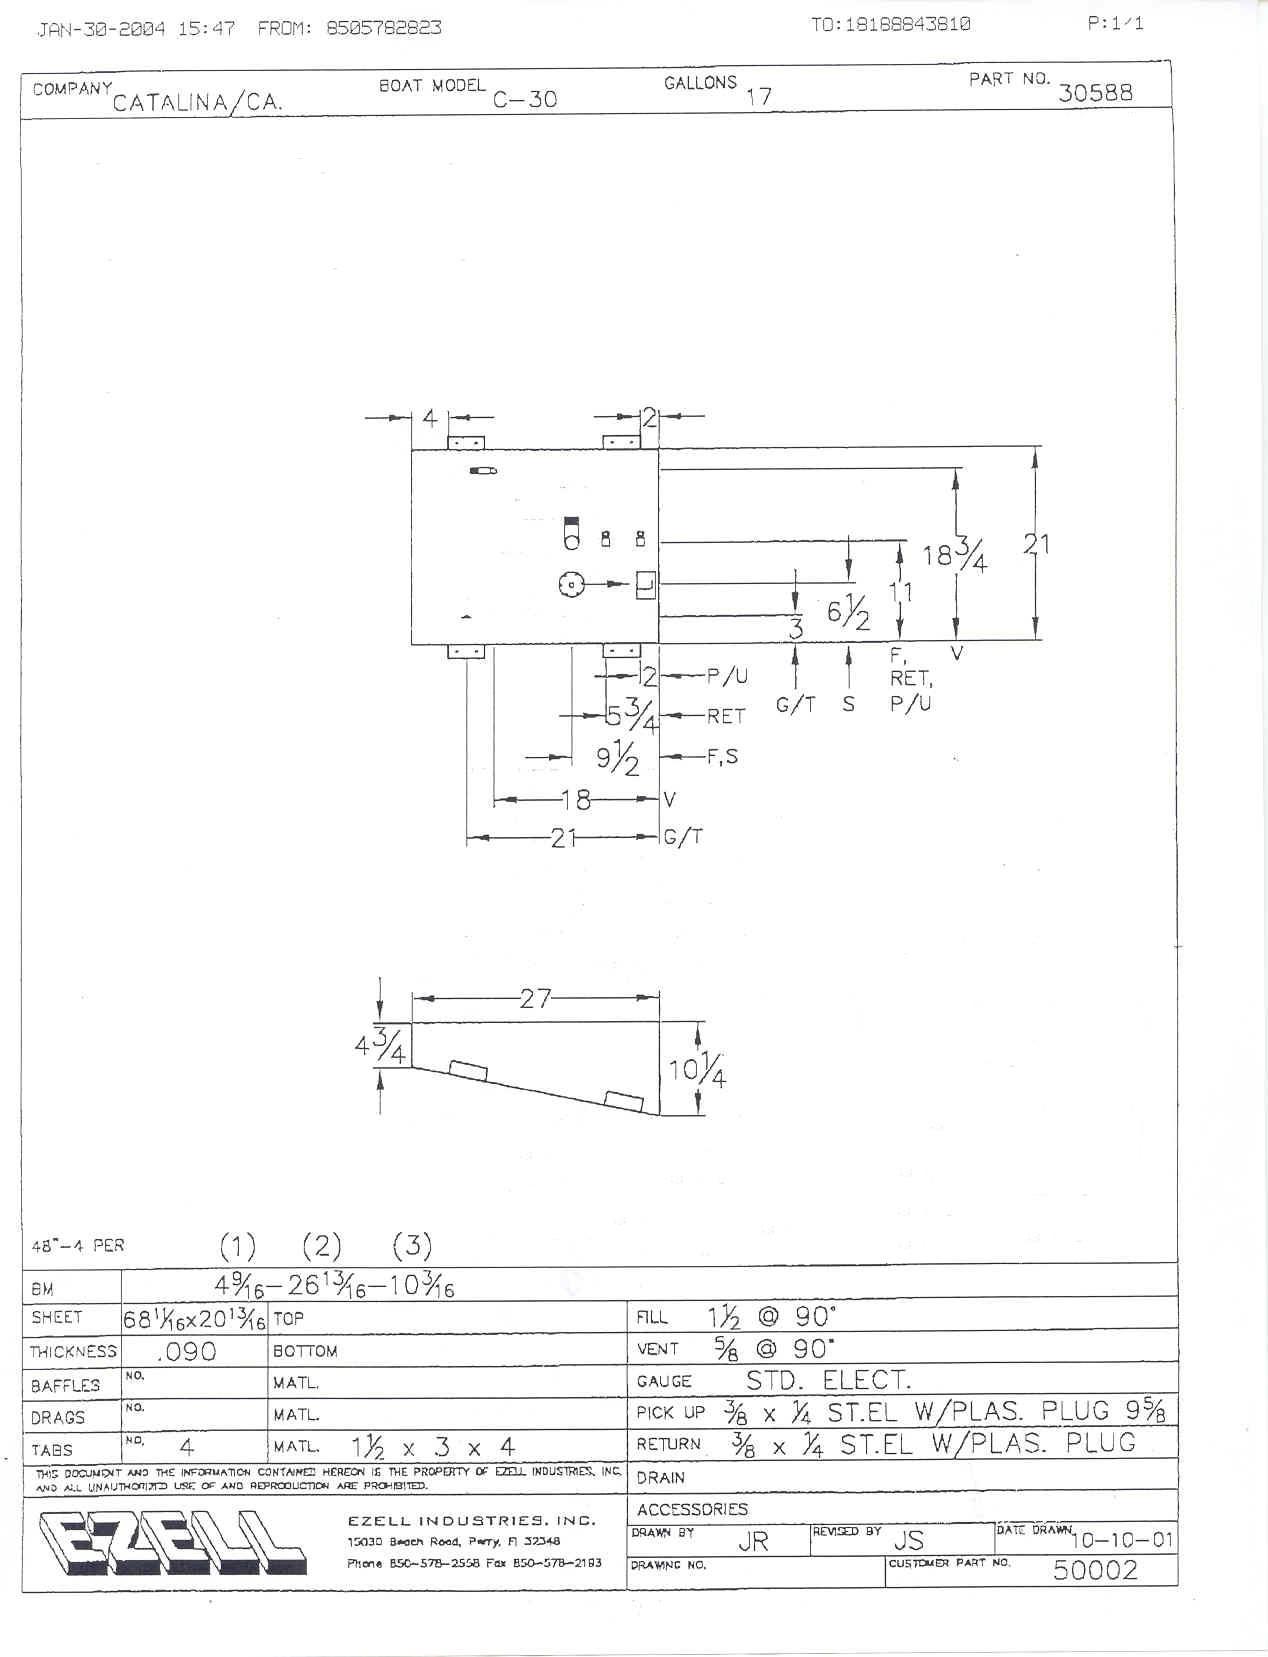 Snorkel 5000 Scissor Lift Wiring Diagram Pdf Table Of Contents Of Snorkel 5000 Scissor Lift Wiring Diagram Pdf